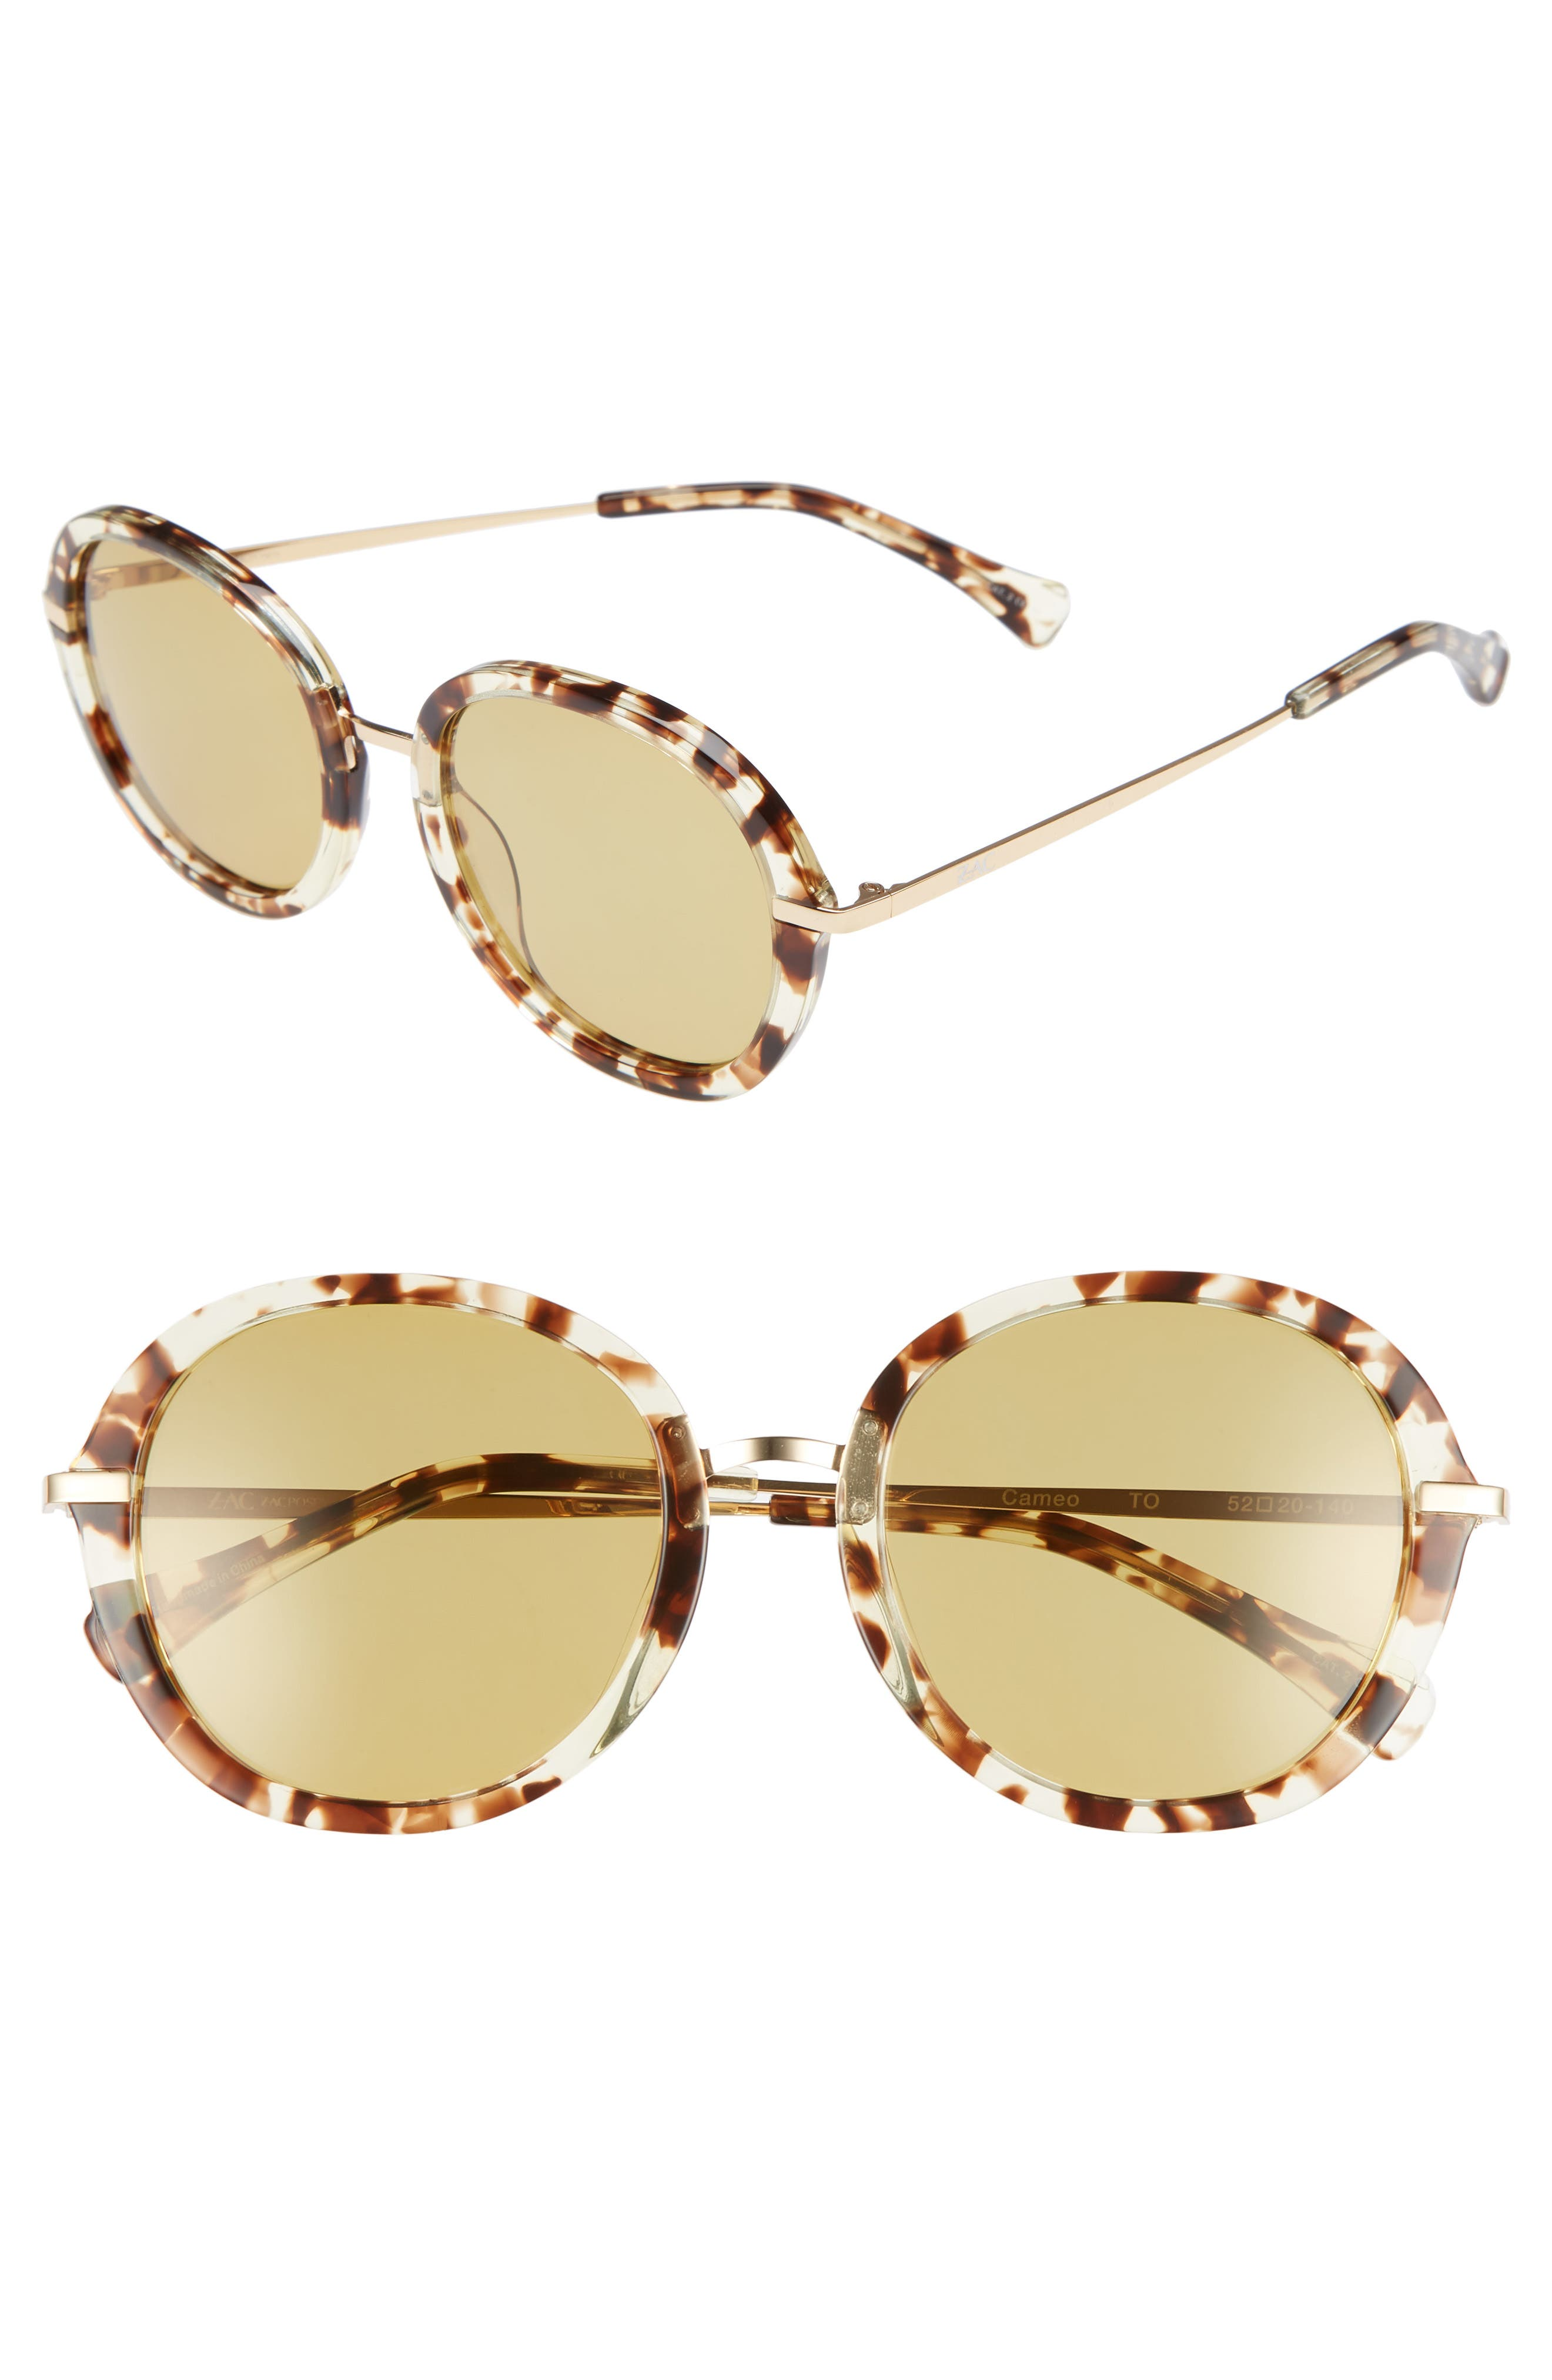 Cameo 52mm Round Sunglasses,                             Main thumbnail 1, color,                             TORTOISE POLAR/ GOLD